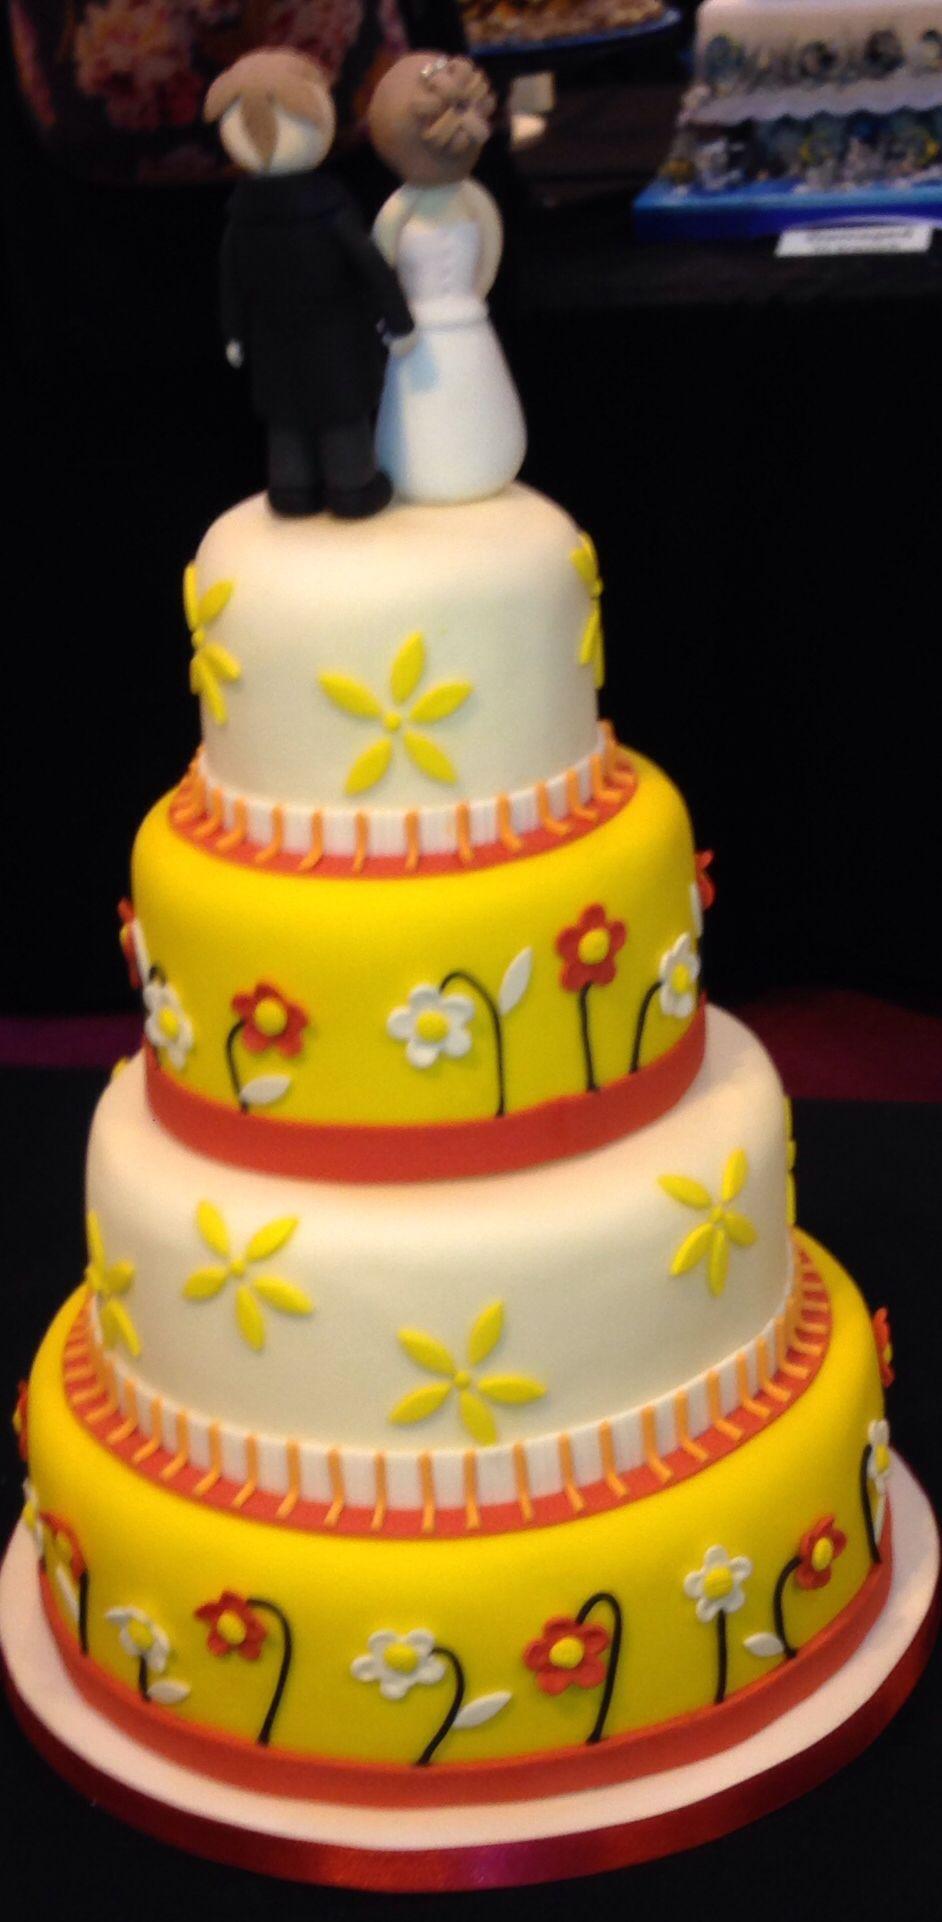 Cake international cake international cake desserts